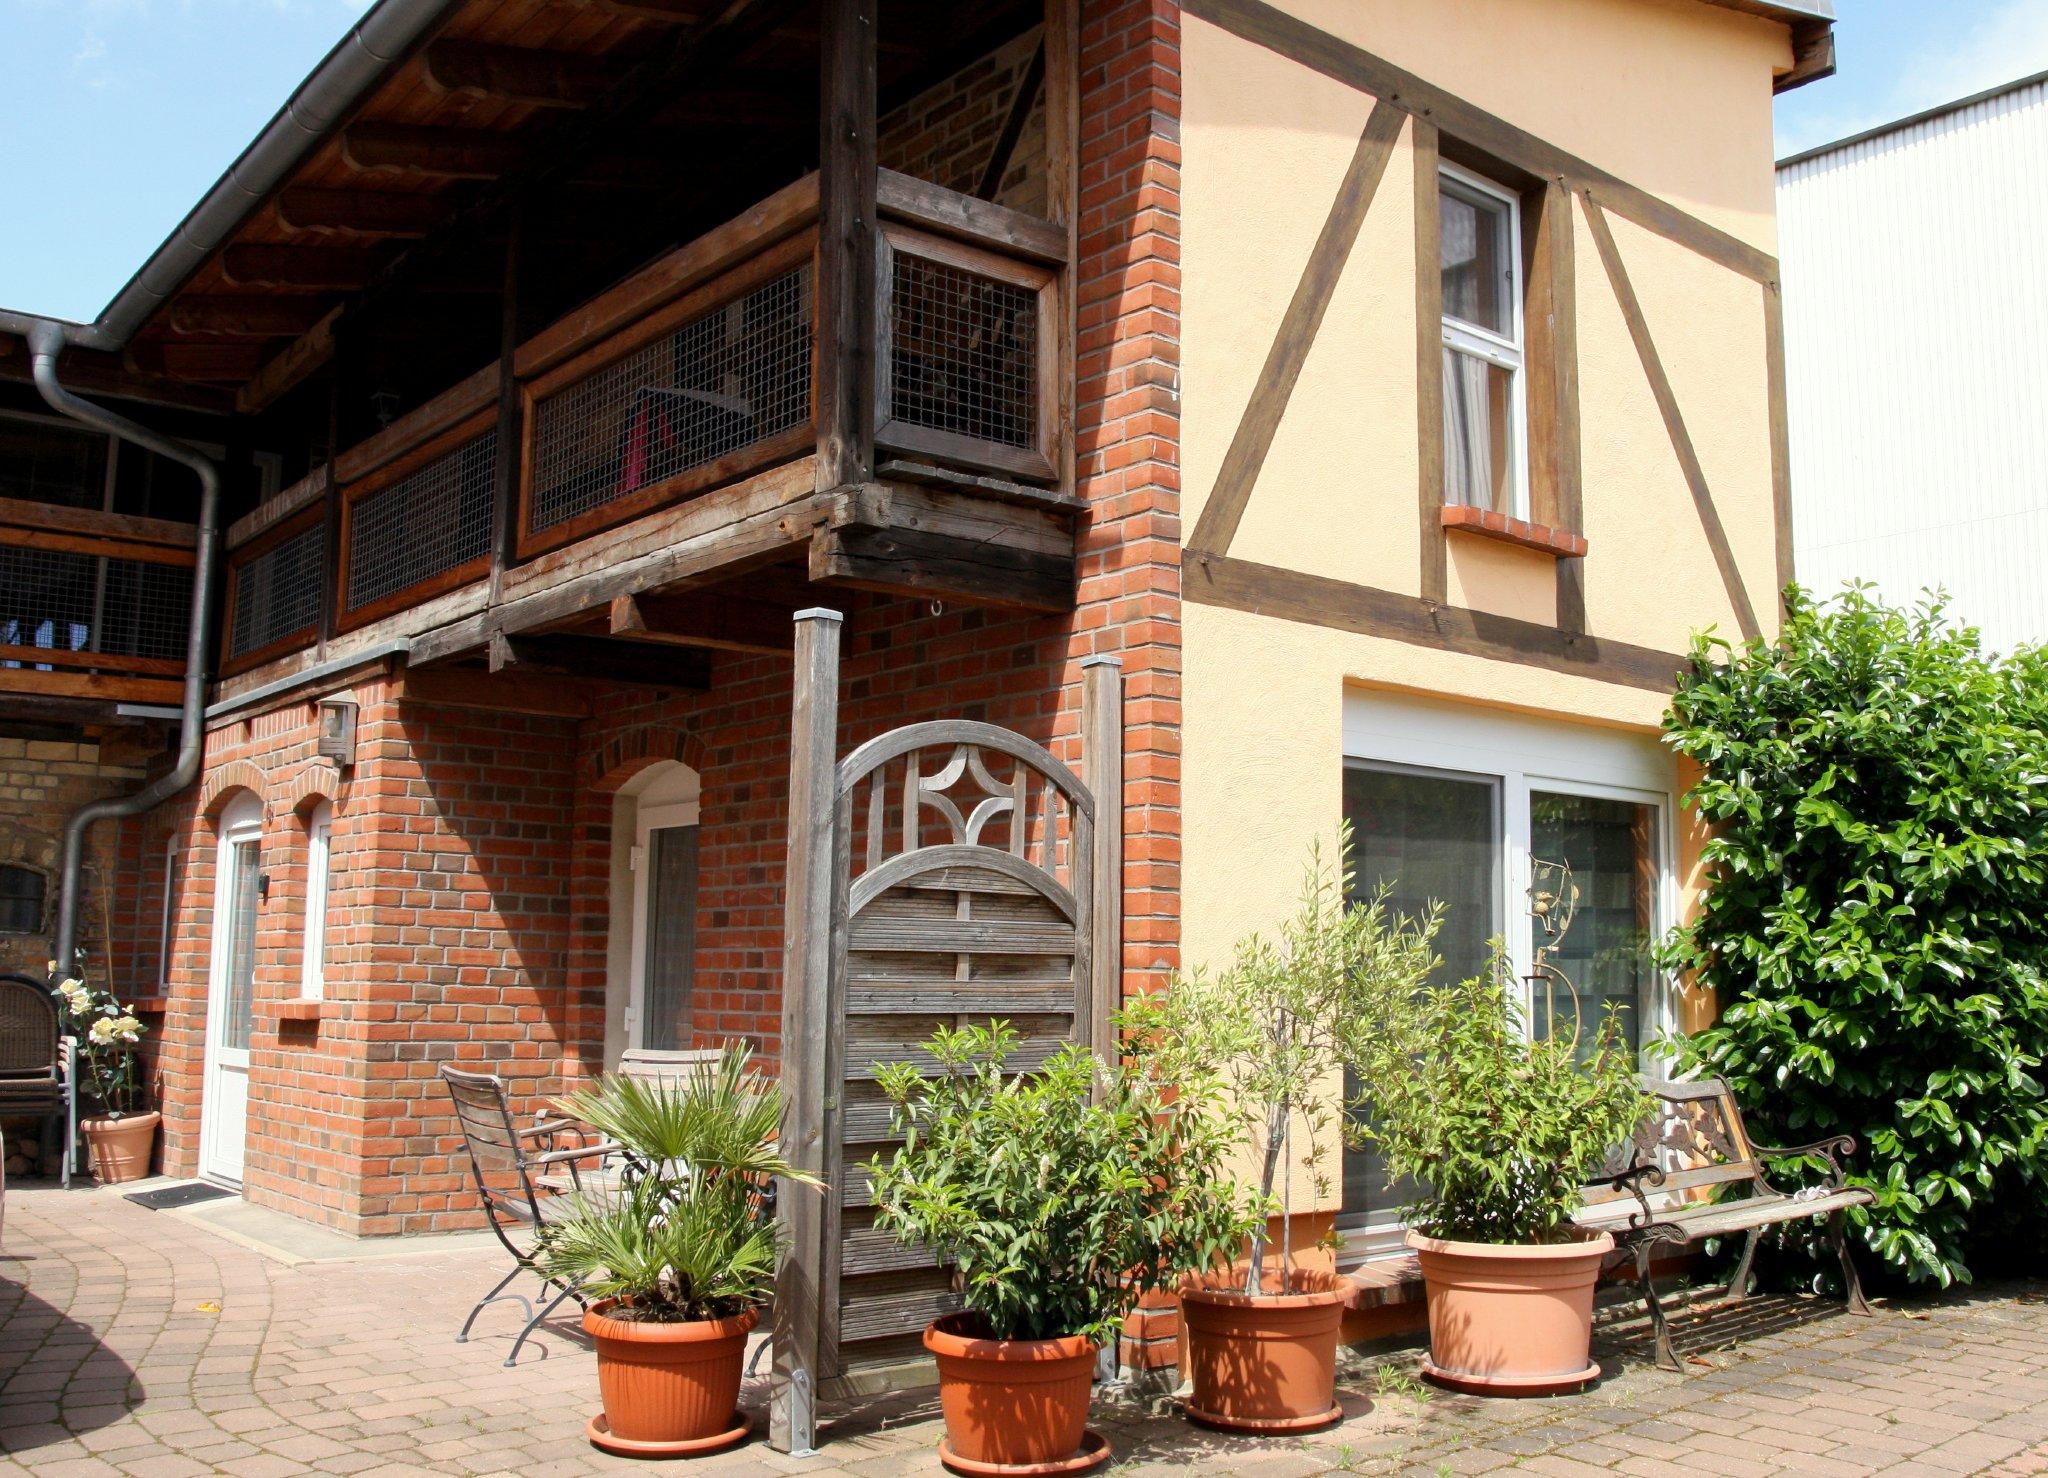 TOSKANA - Blick zum Innenhof - Veranda